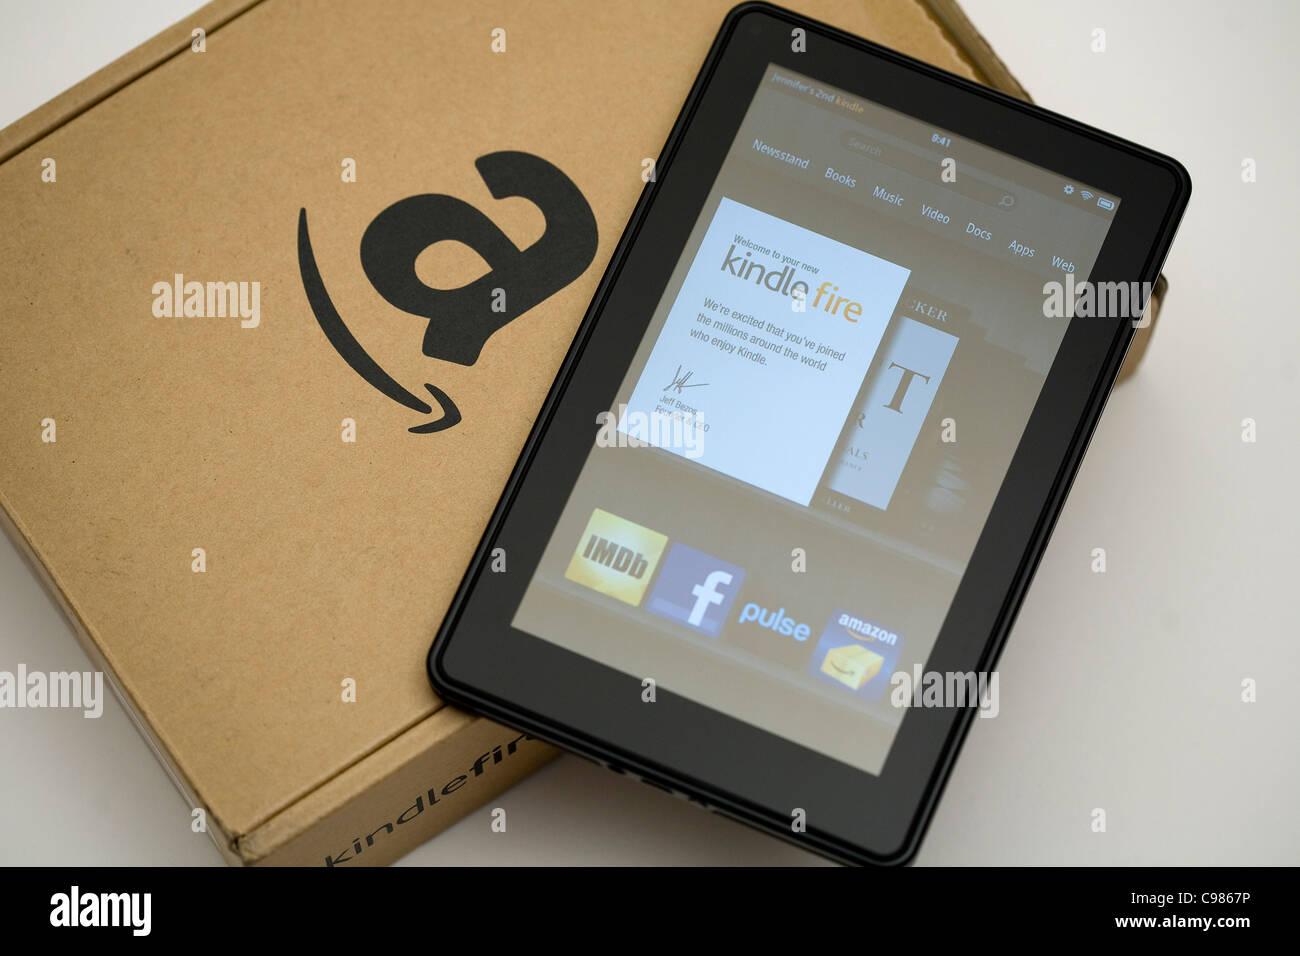 L'Amazon.com Kindle Fire tablet computer. Photo Stock